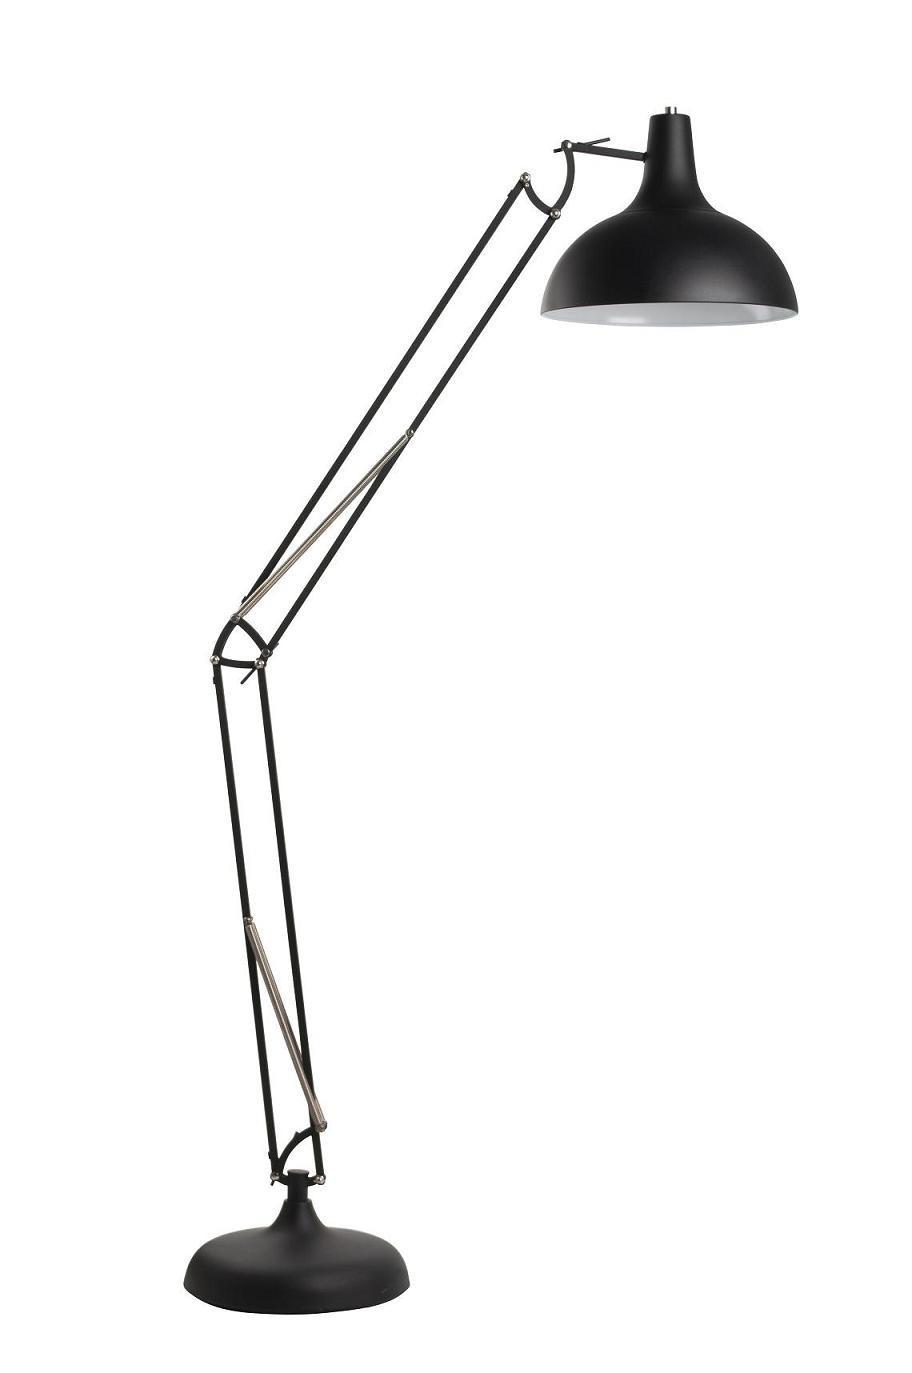 Lampadaire industriel OFFICE - Noir